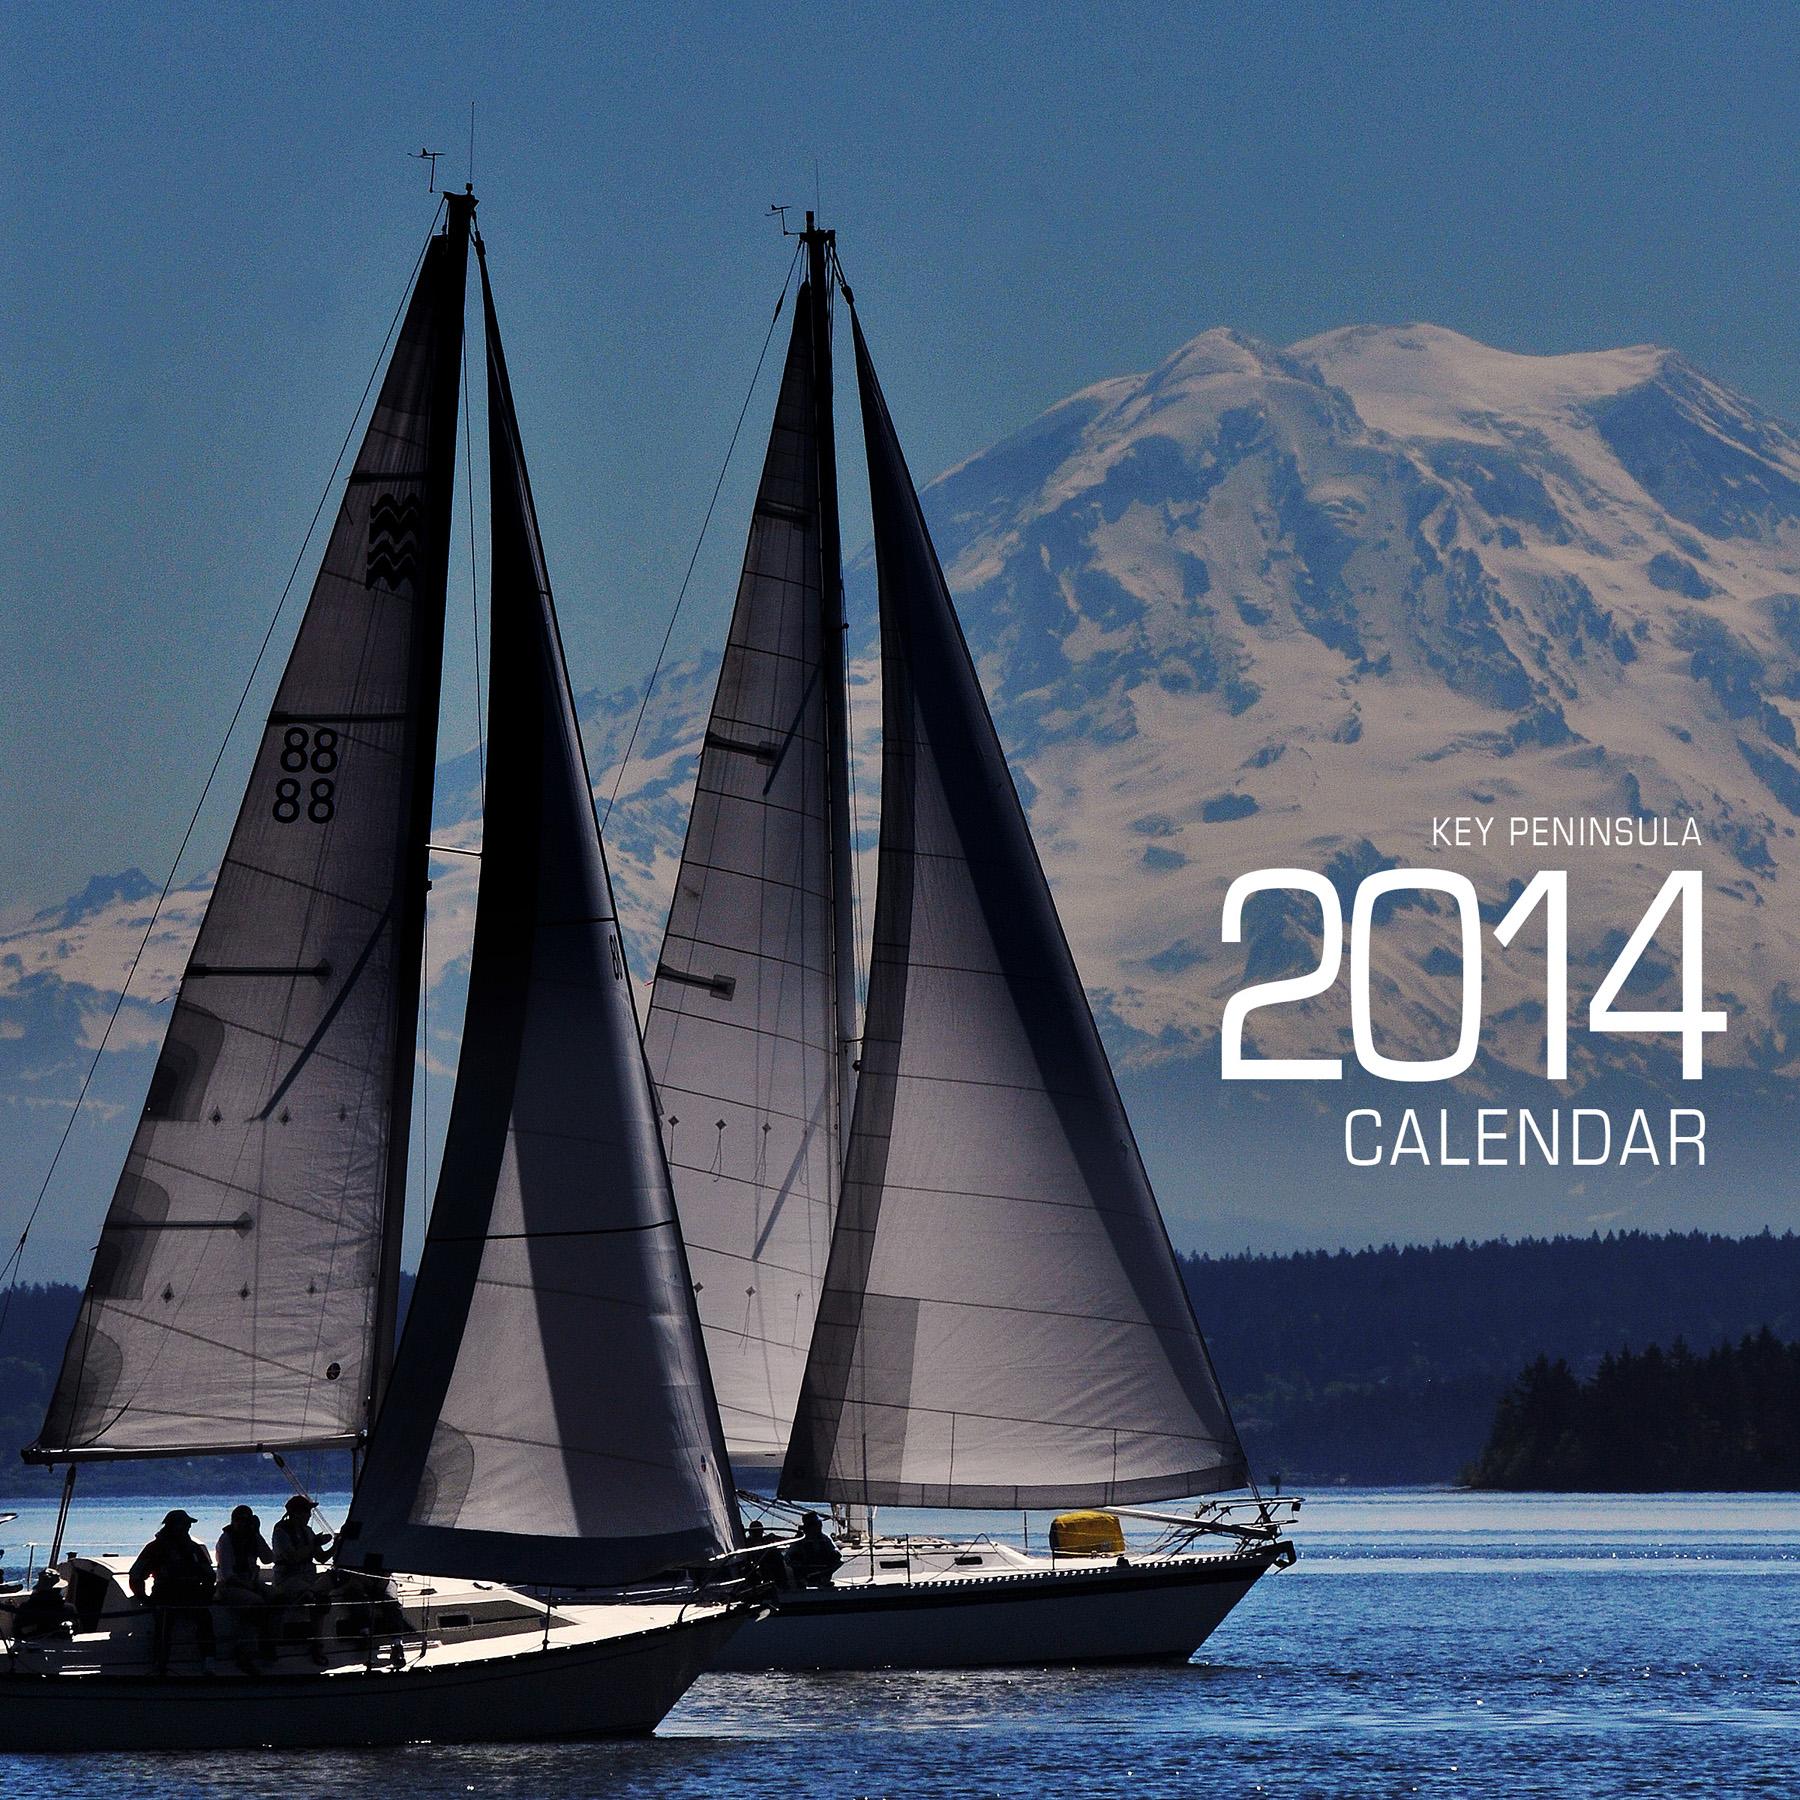 Calendar Cover : Key peninsula calendar longbranch chronicles